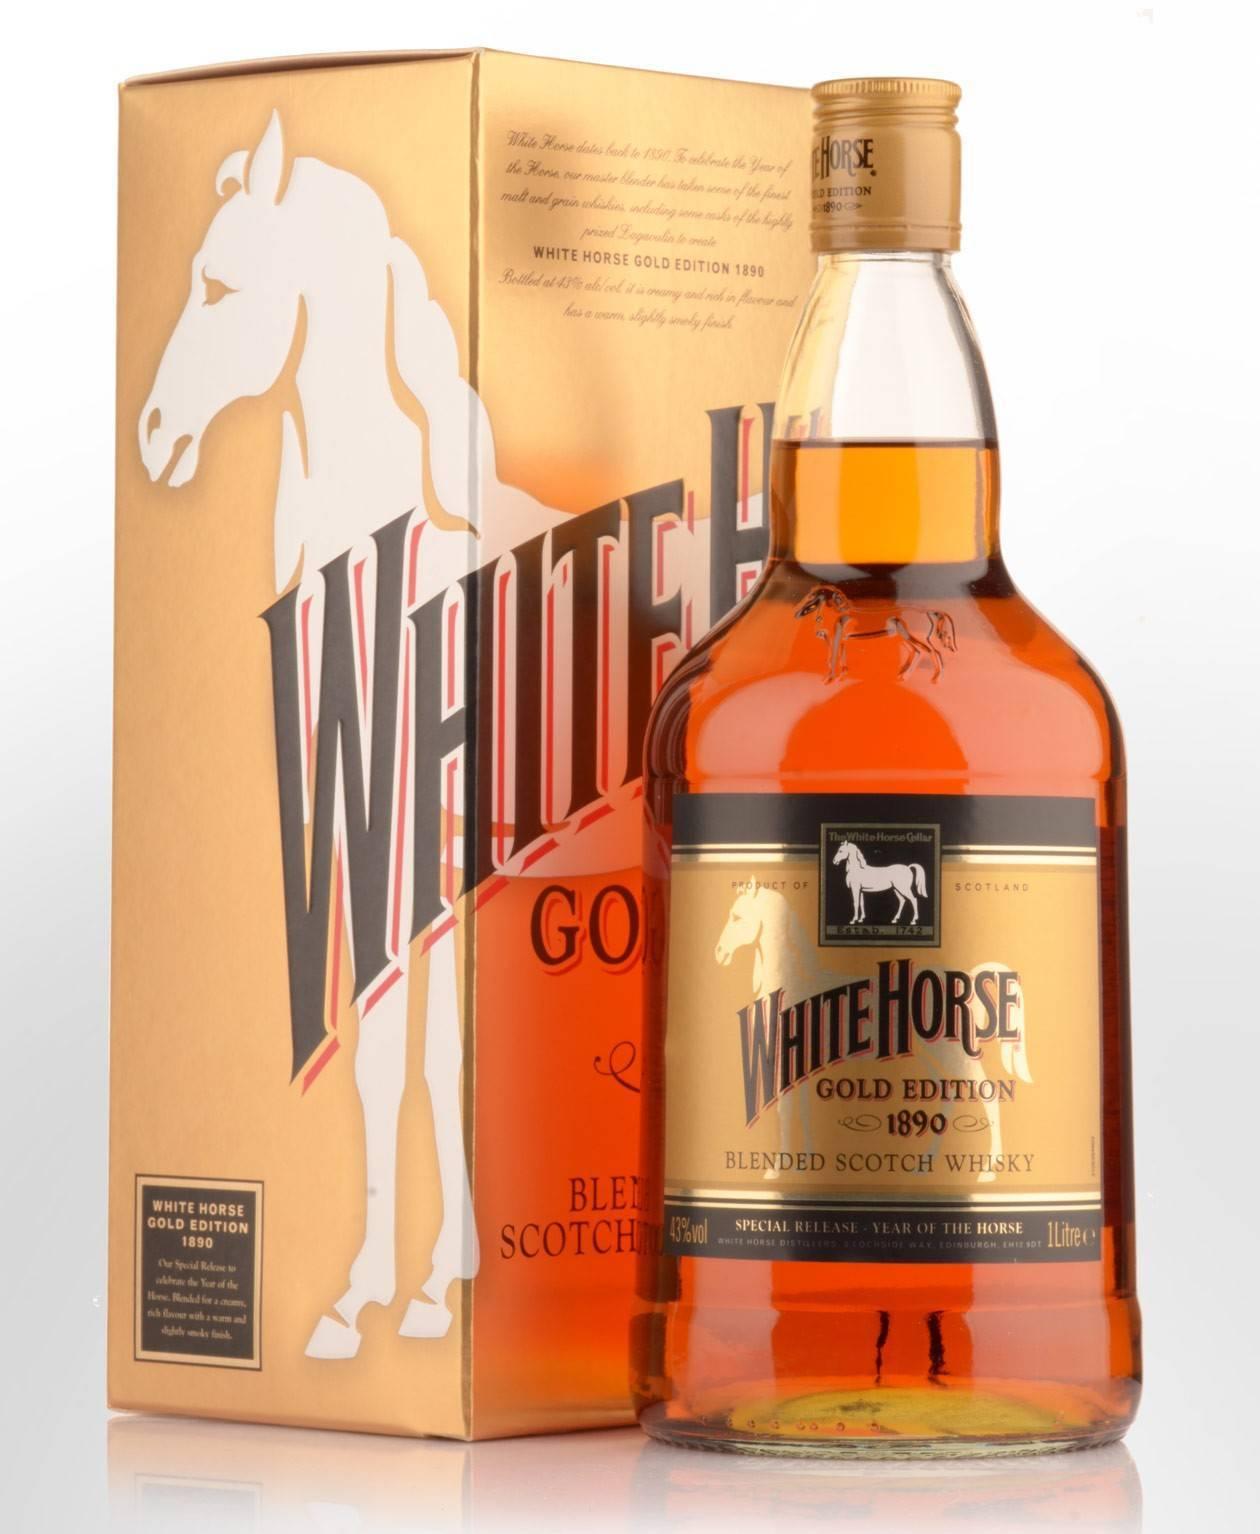 Белая лошадь (white horse) — виски для гурманов крепких напитков